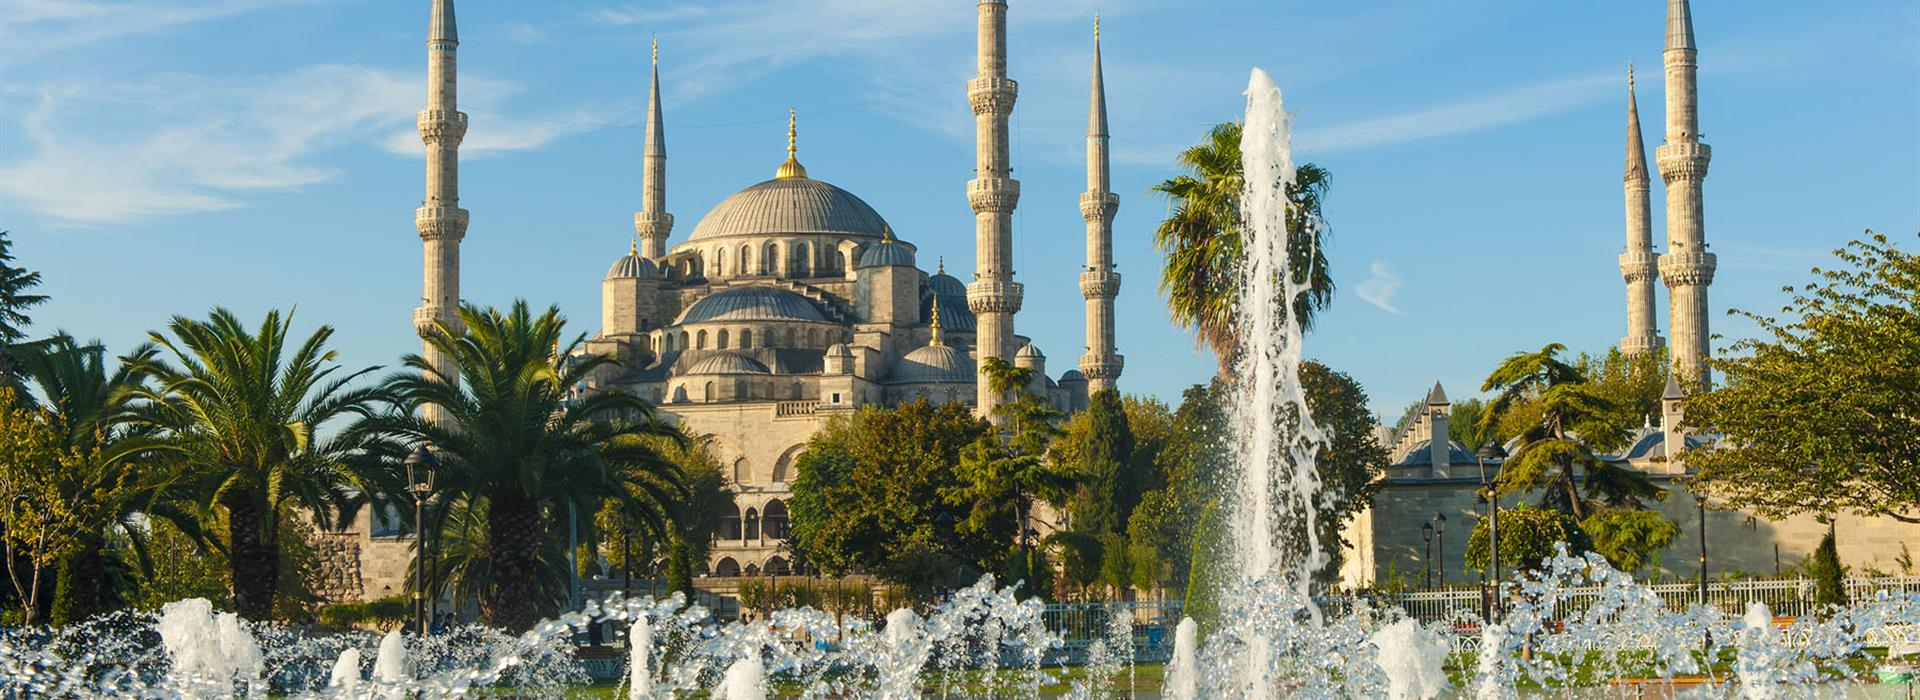 Turkey-Konstantinoupoli_233852971